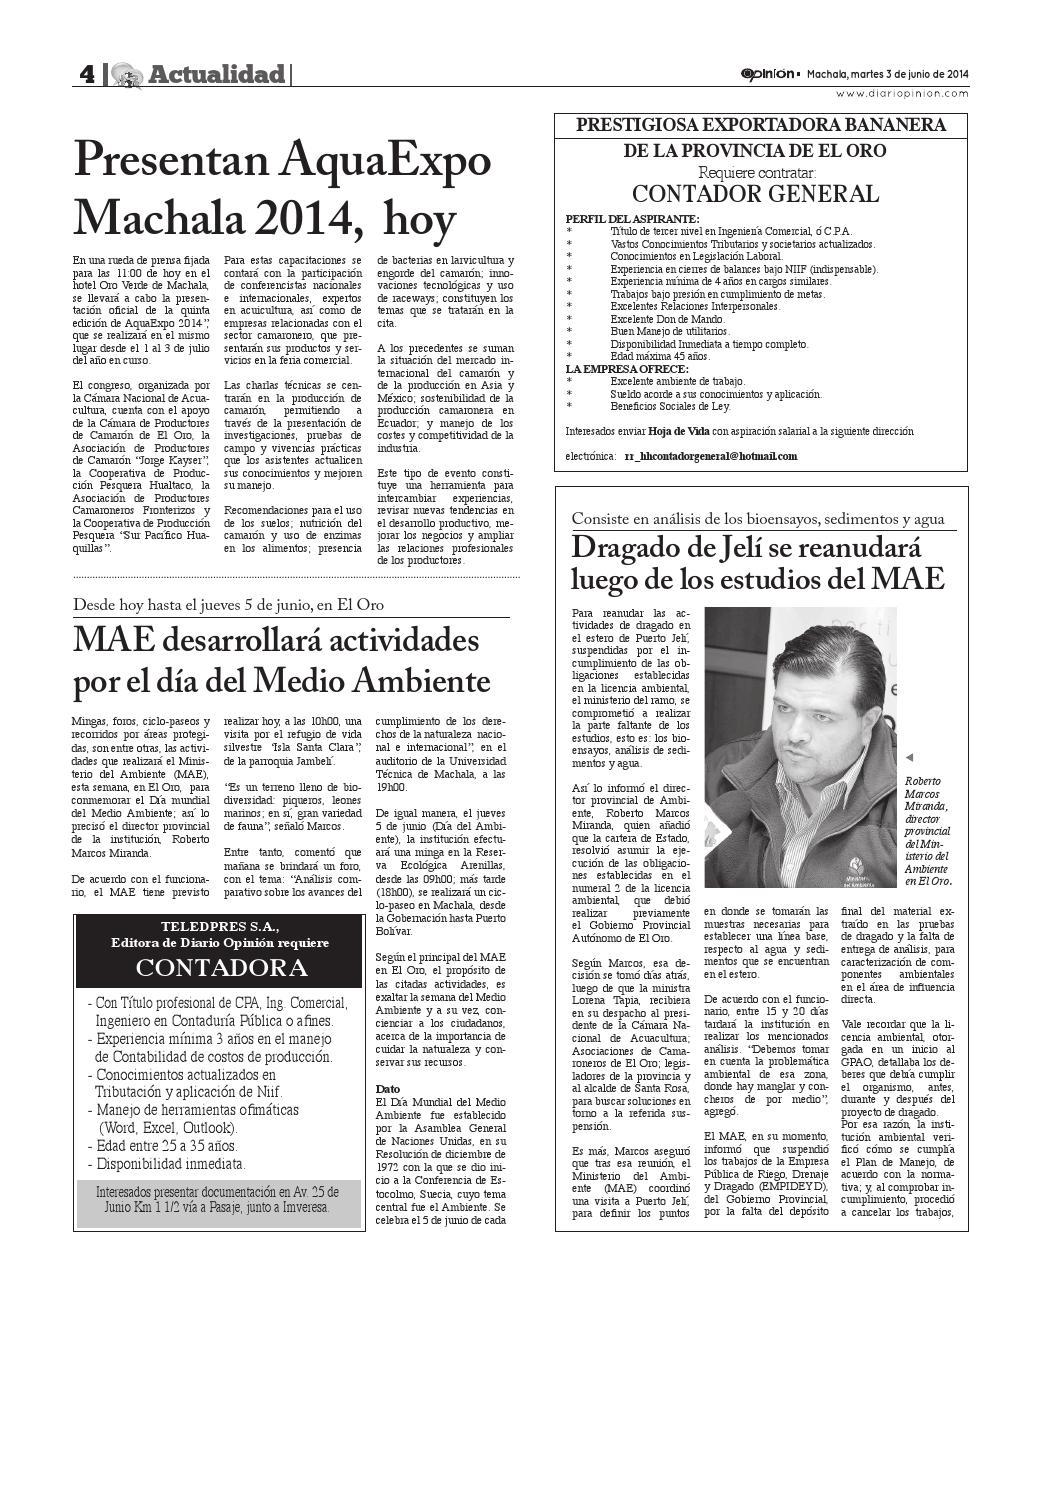 Impreso 03 06 14 by Diario Opinion - issuu